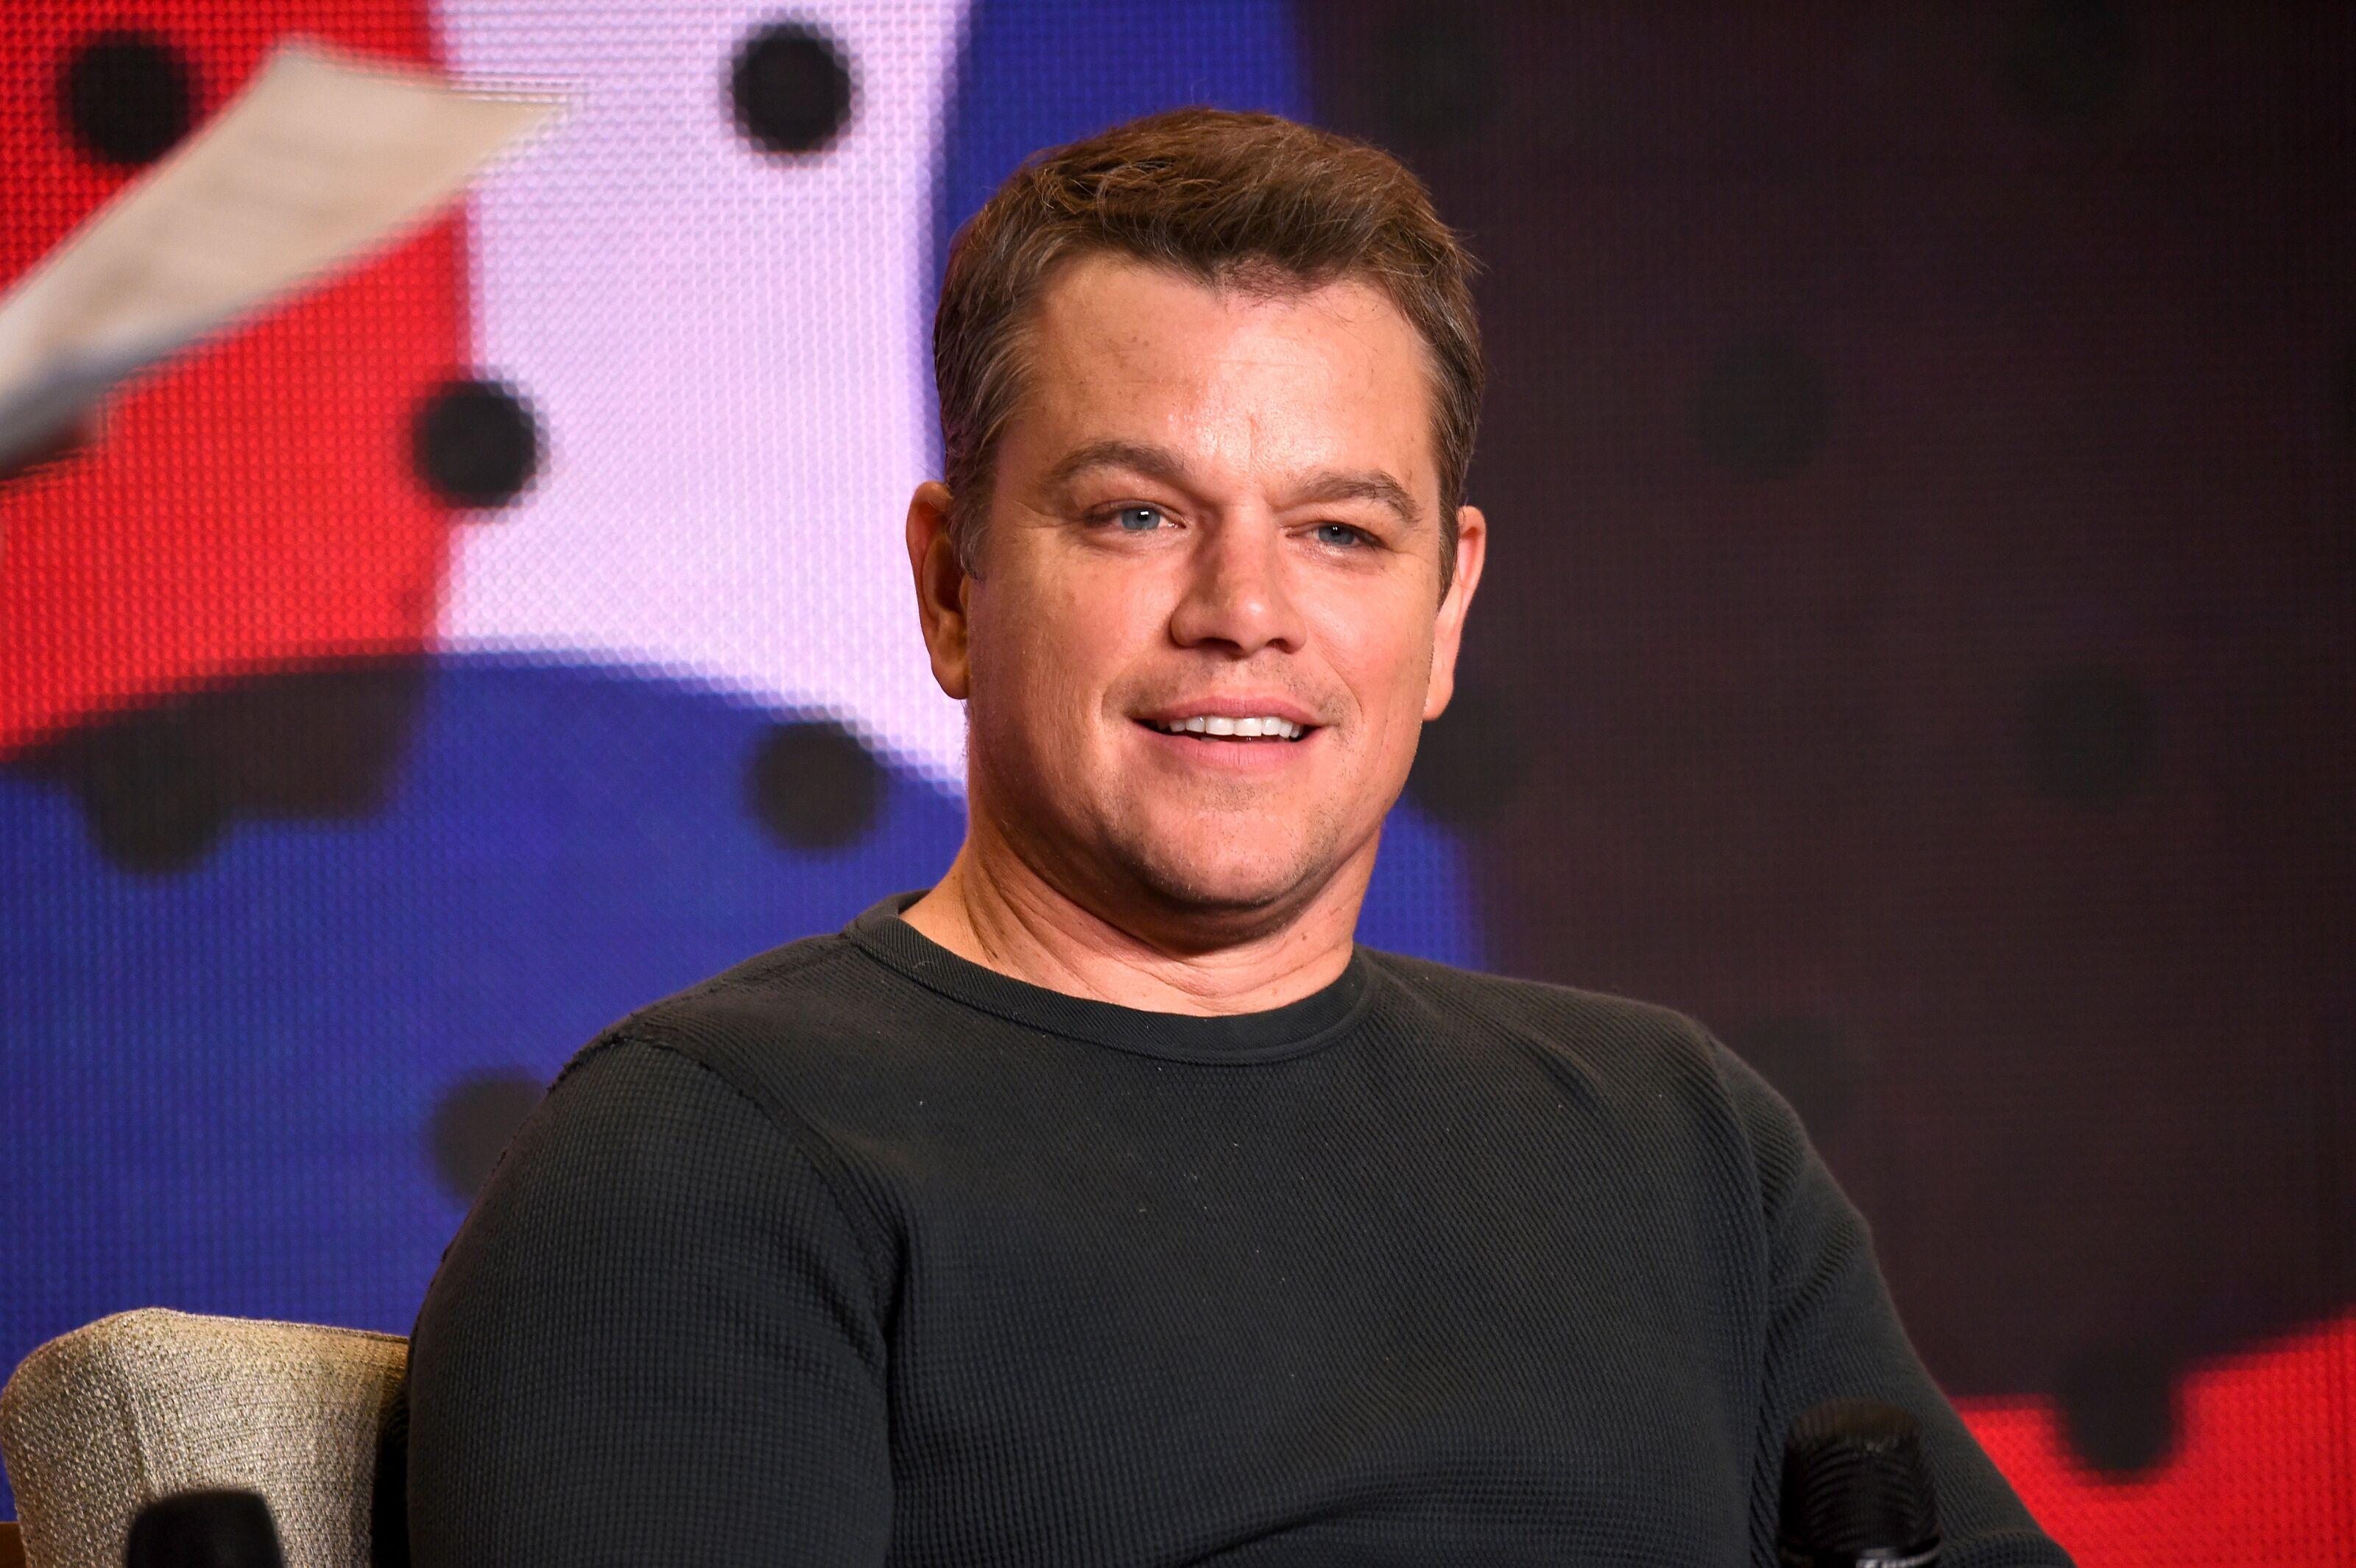 Saturday Night Live: The three best sketches with host Matt Damon